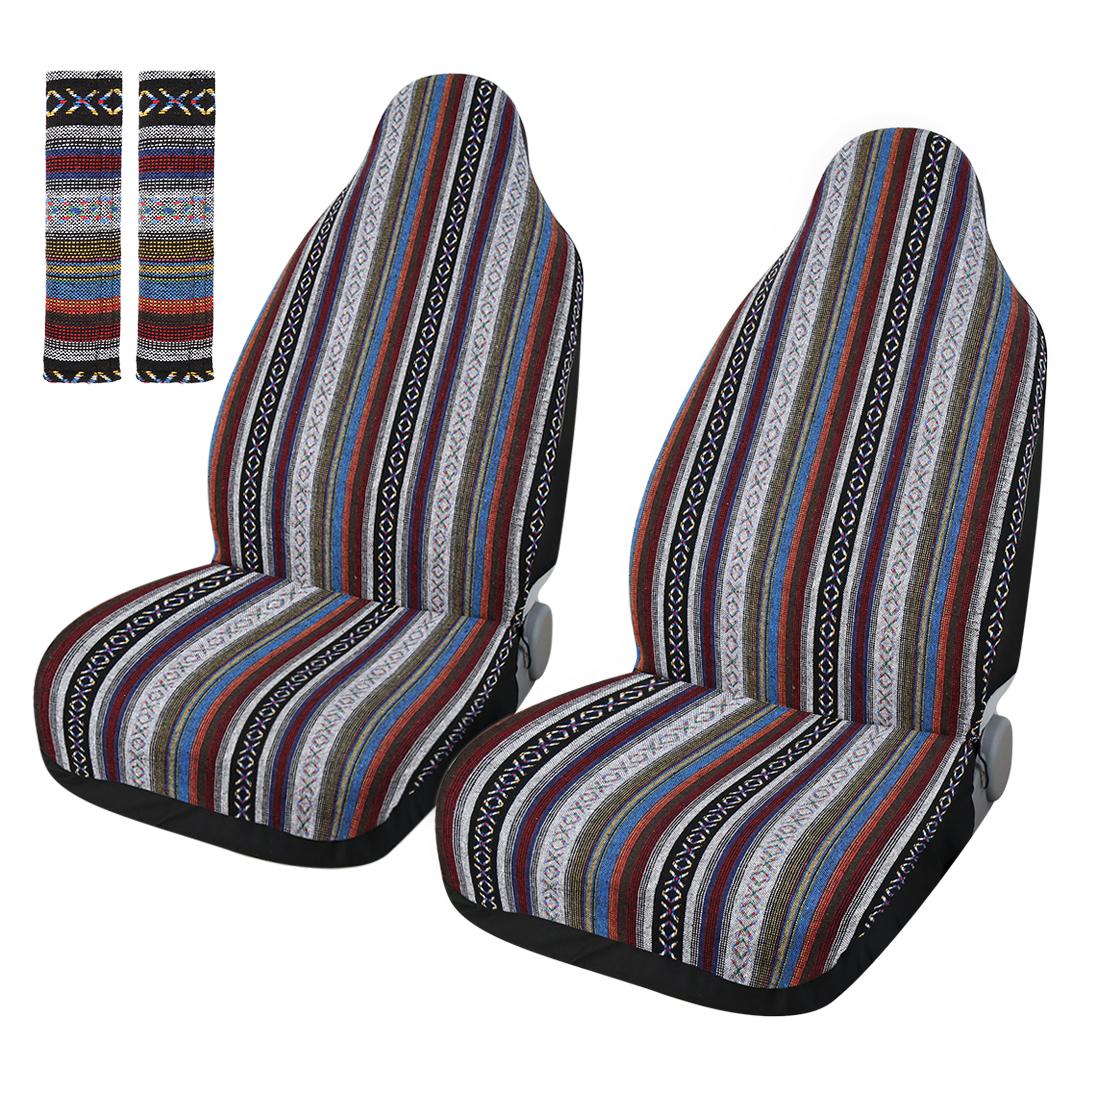 2 Pcs Universal Car Front Seat Cover Saddle Blanket Seat-Belt Pad Protectors